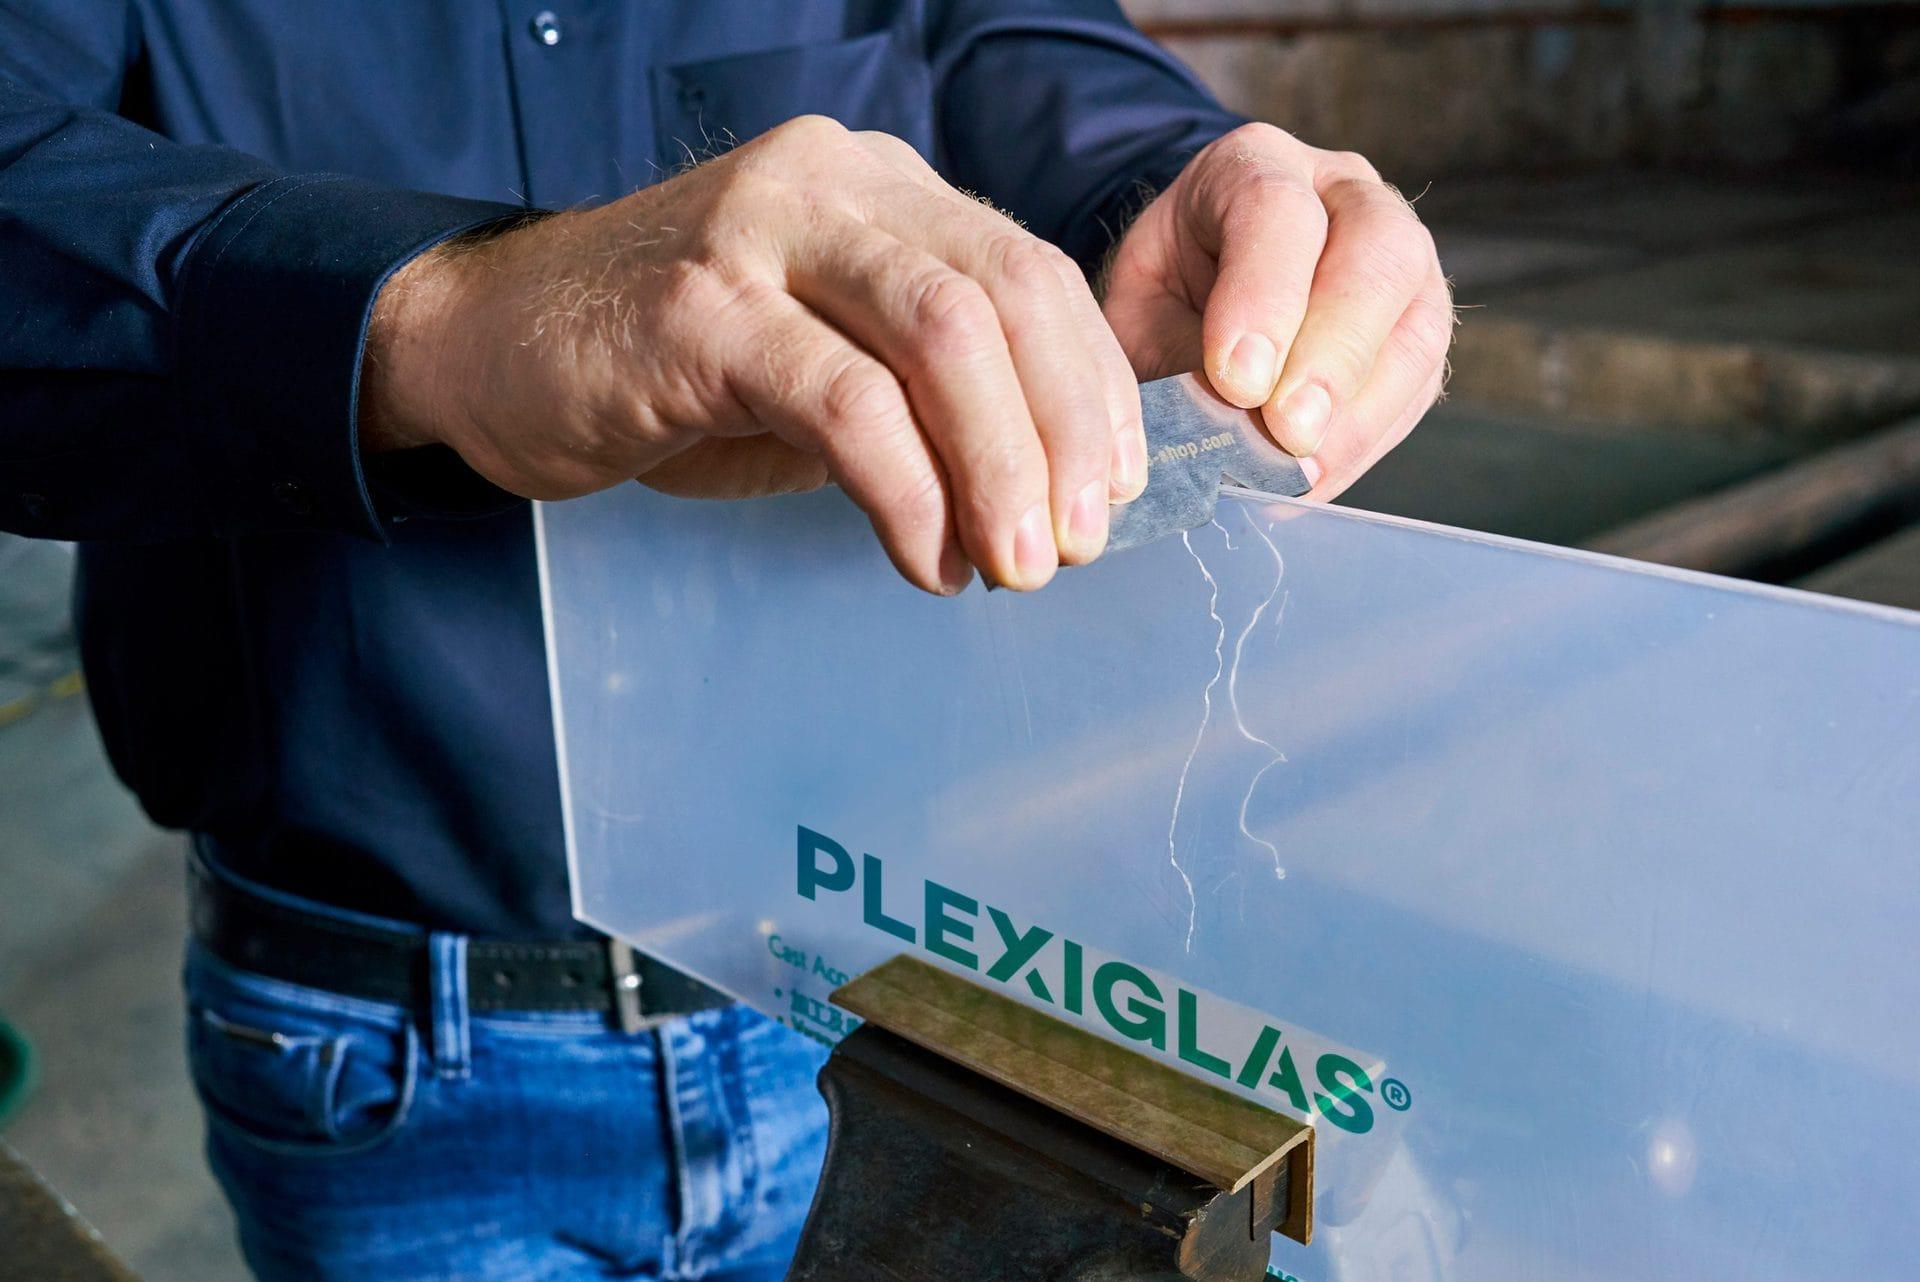 plexiglas_handling_trennen_ziehklinge